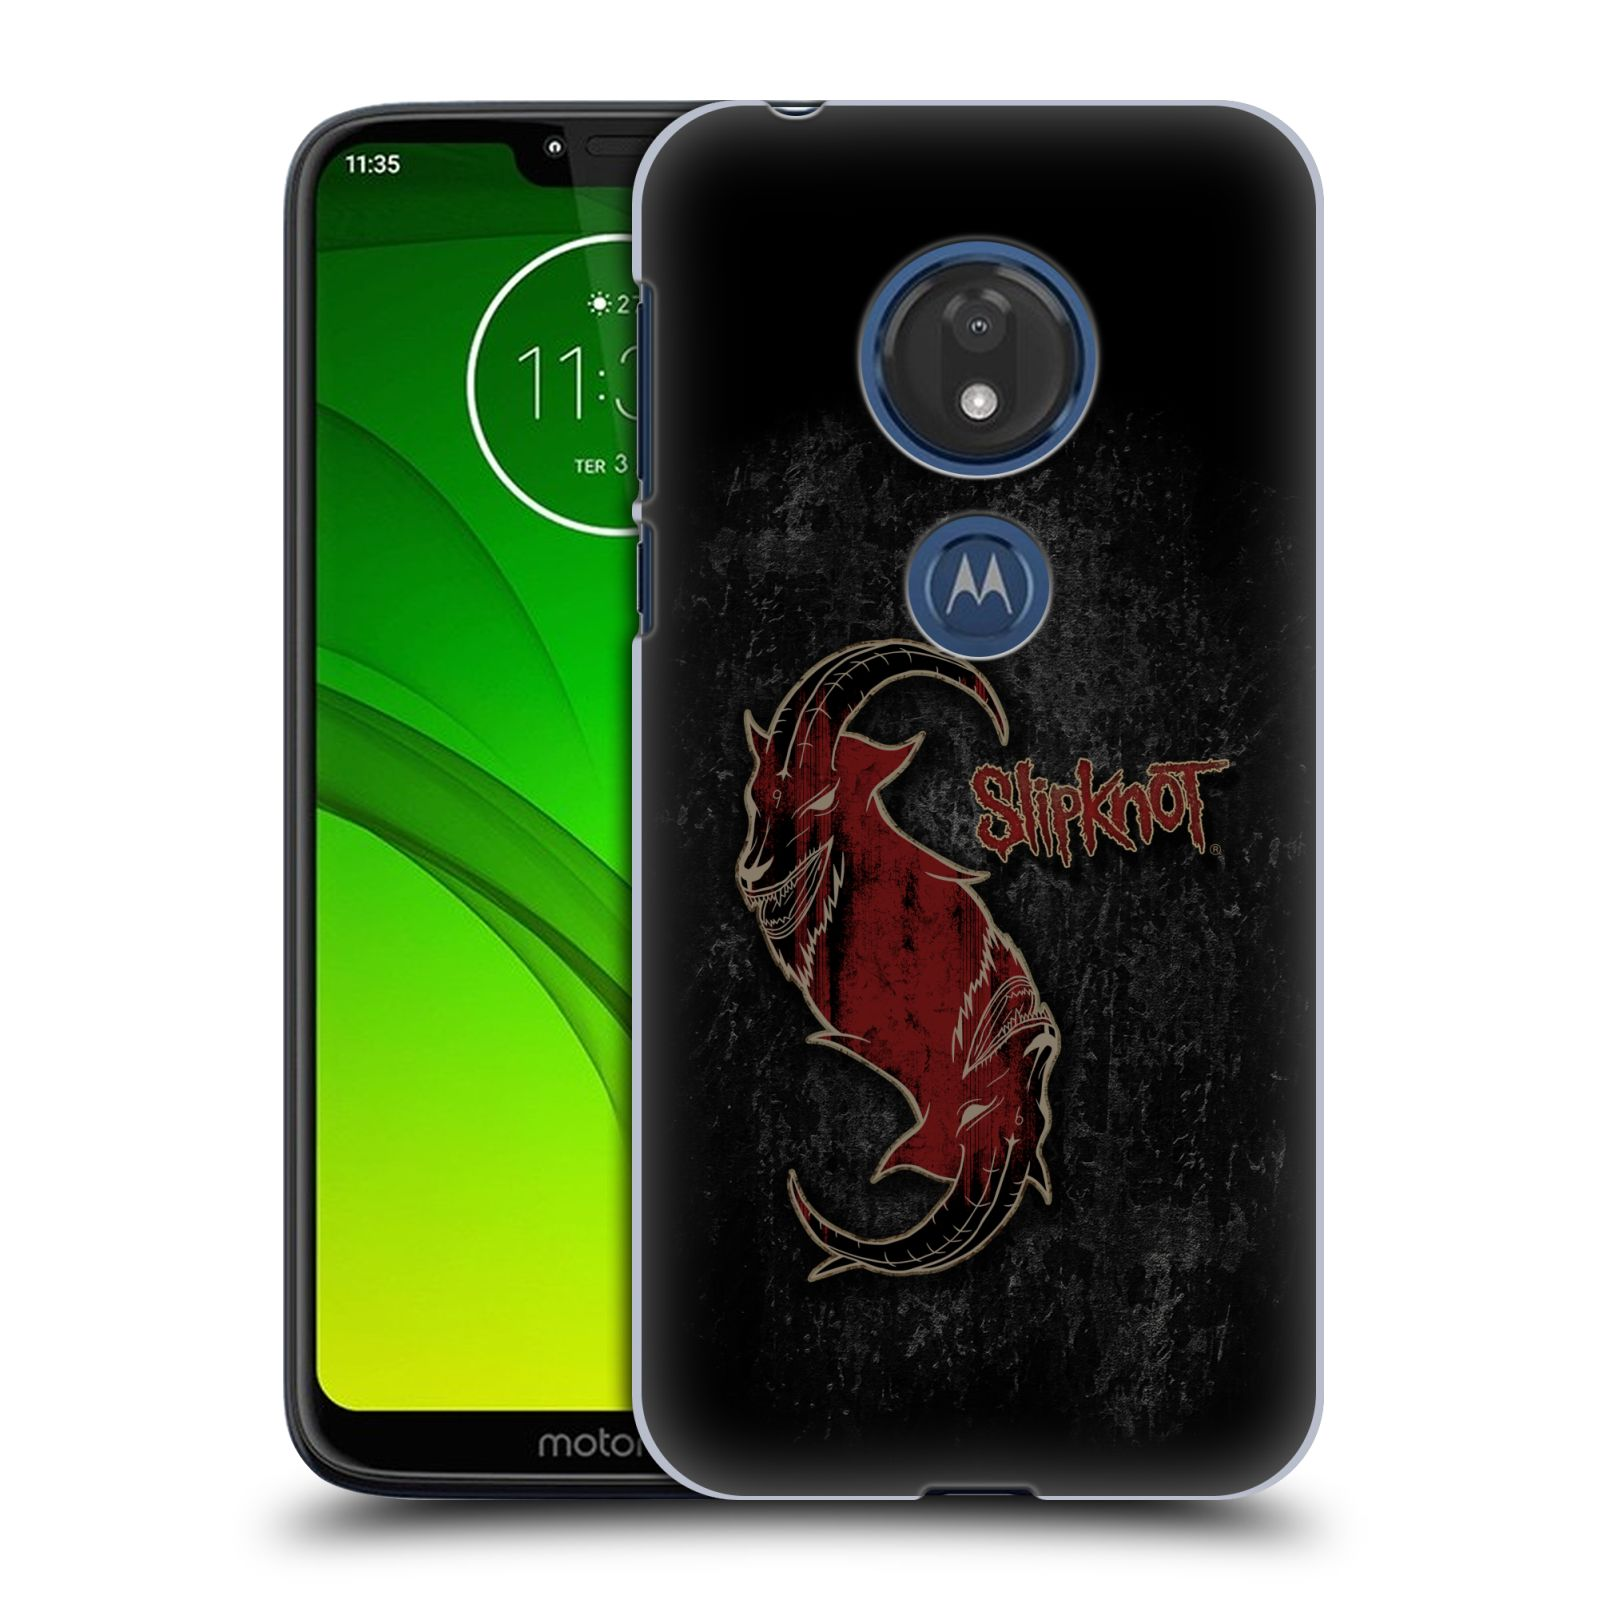 Plastové pouzdro na mobil Motorola Moto G7 Play - Head Case - Slipknot - Rudý kozel